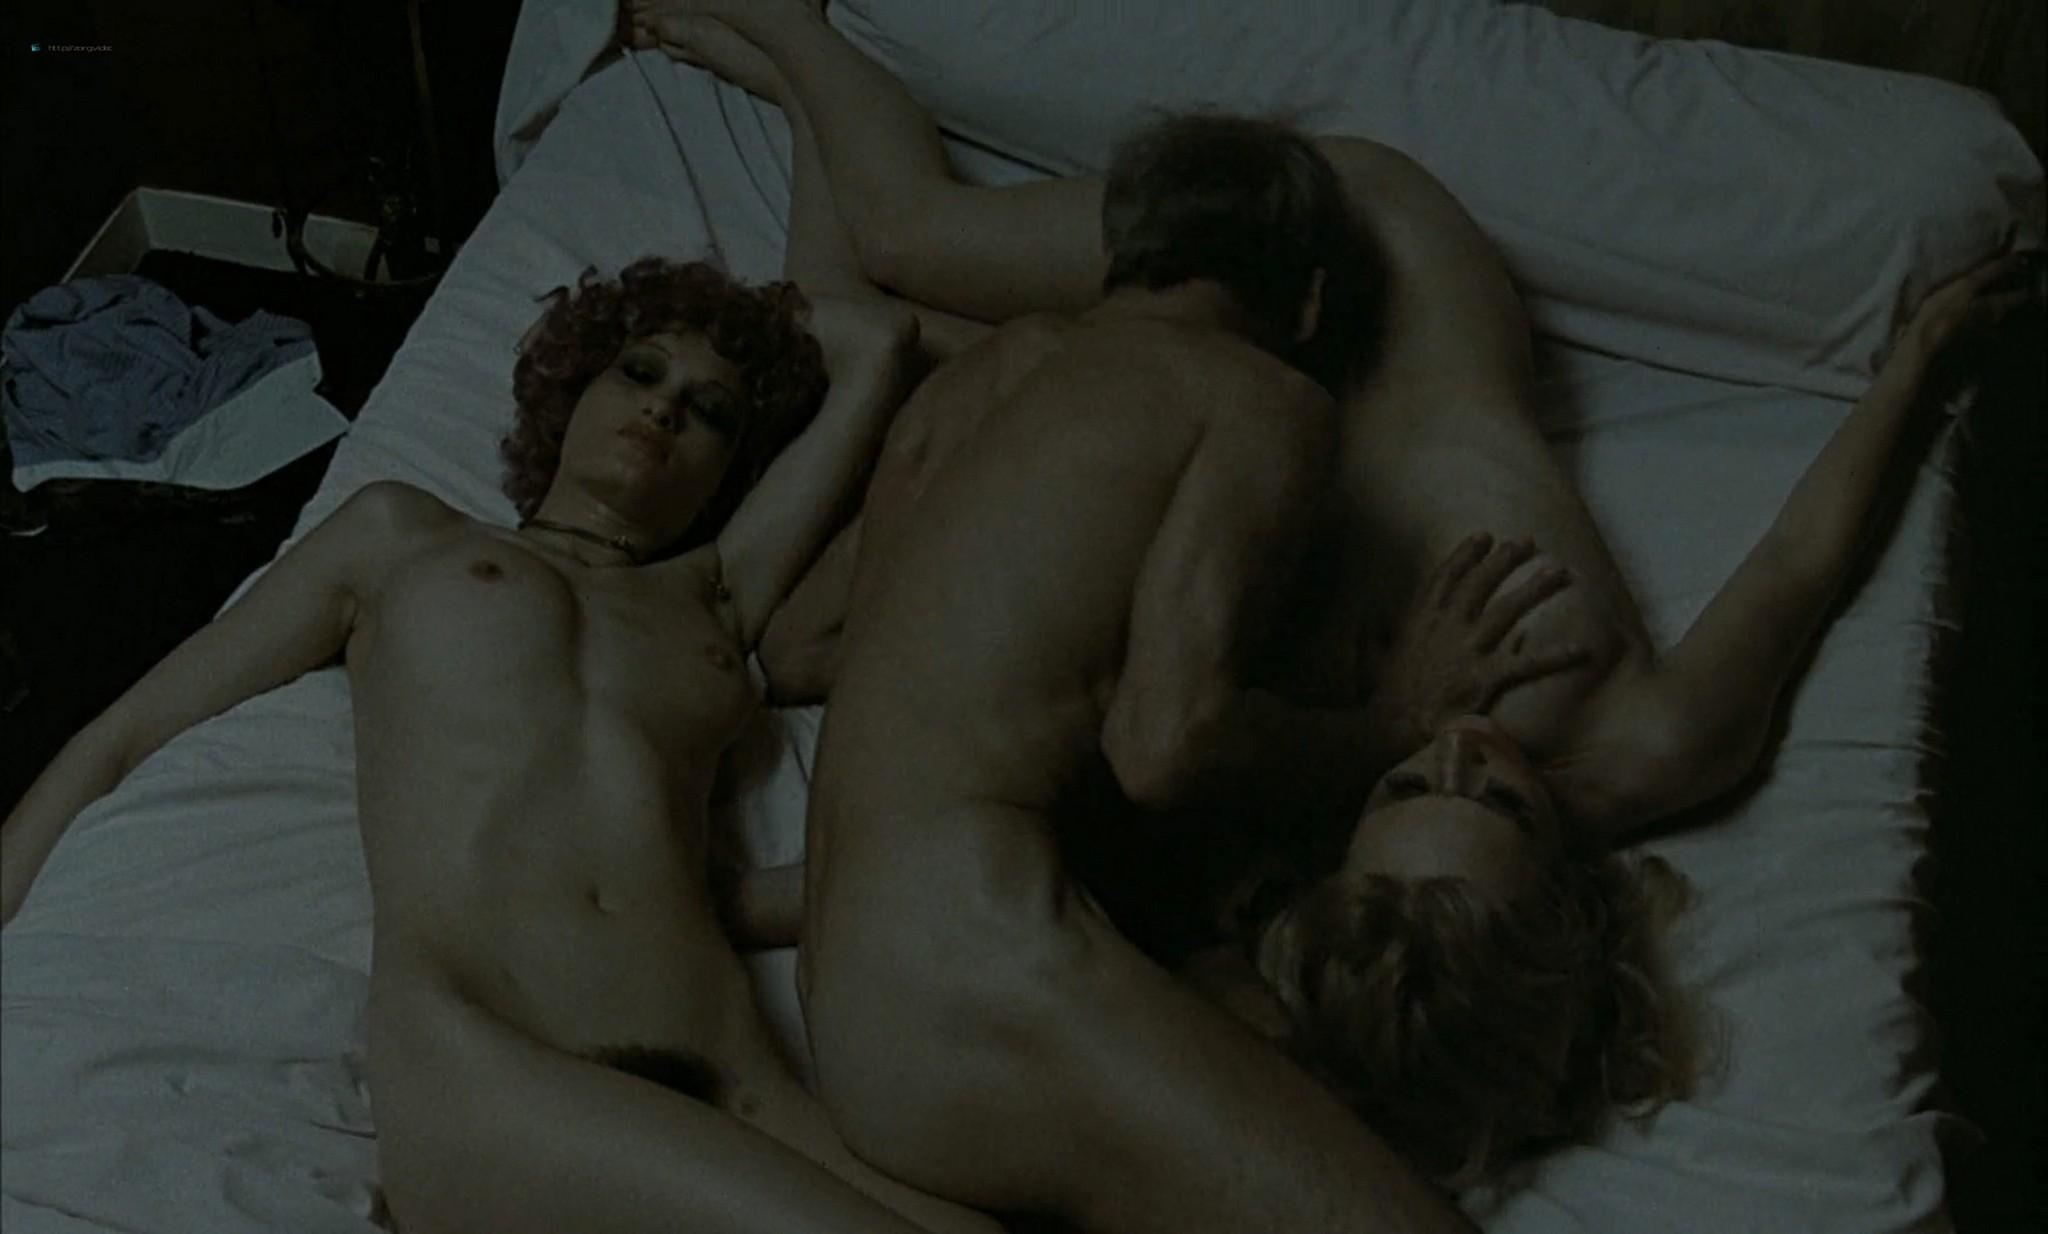 Romy Schneider nude butt Nadia Vasil bush others orgy - L'important c'est d'aimer (FR-1975) HD 1080p BluRay (7)